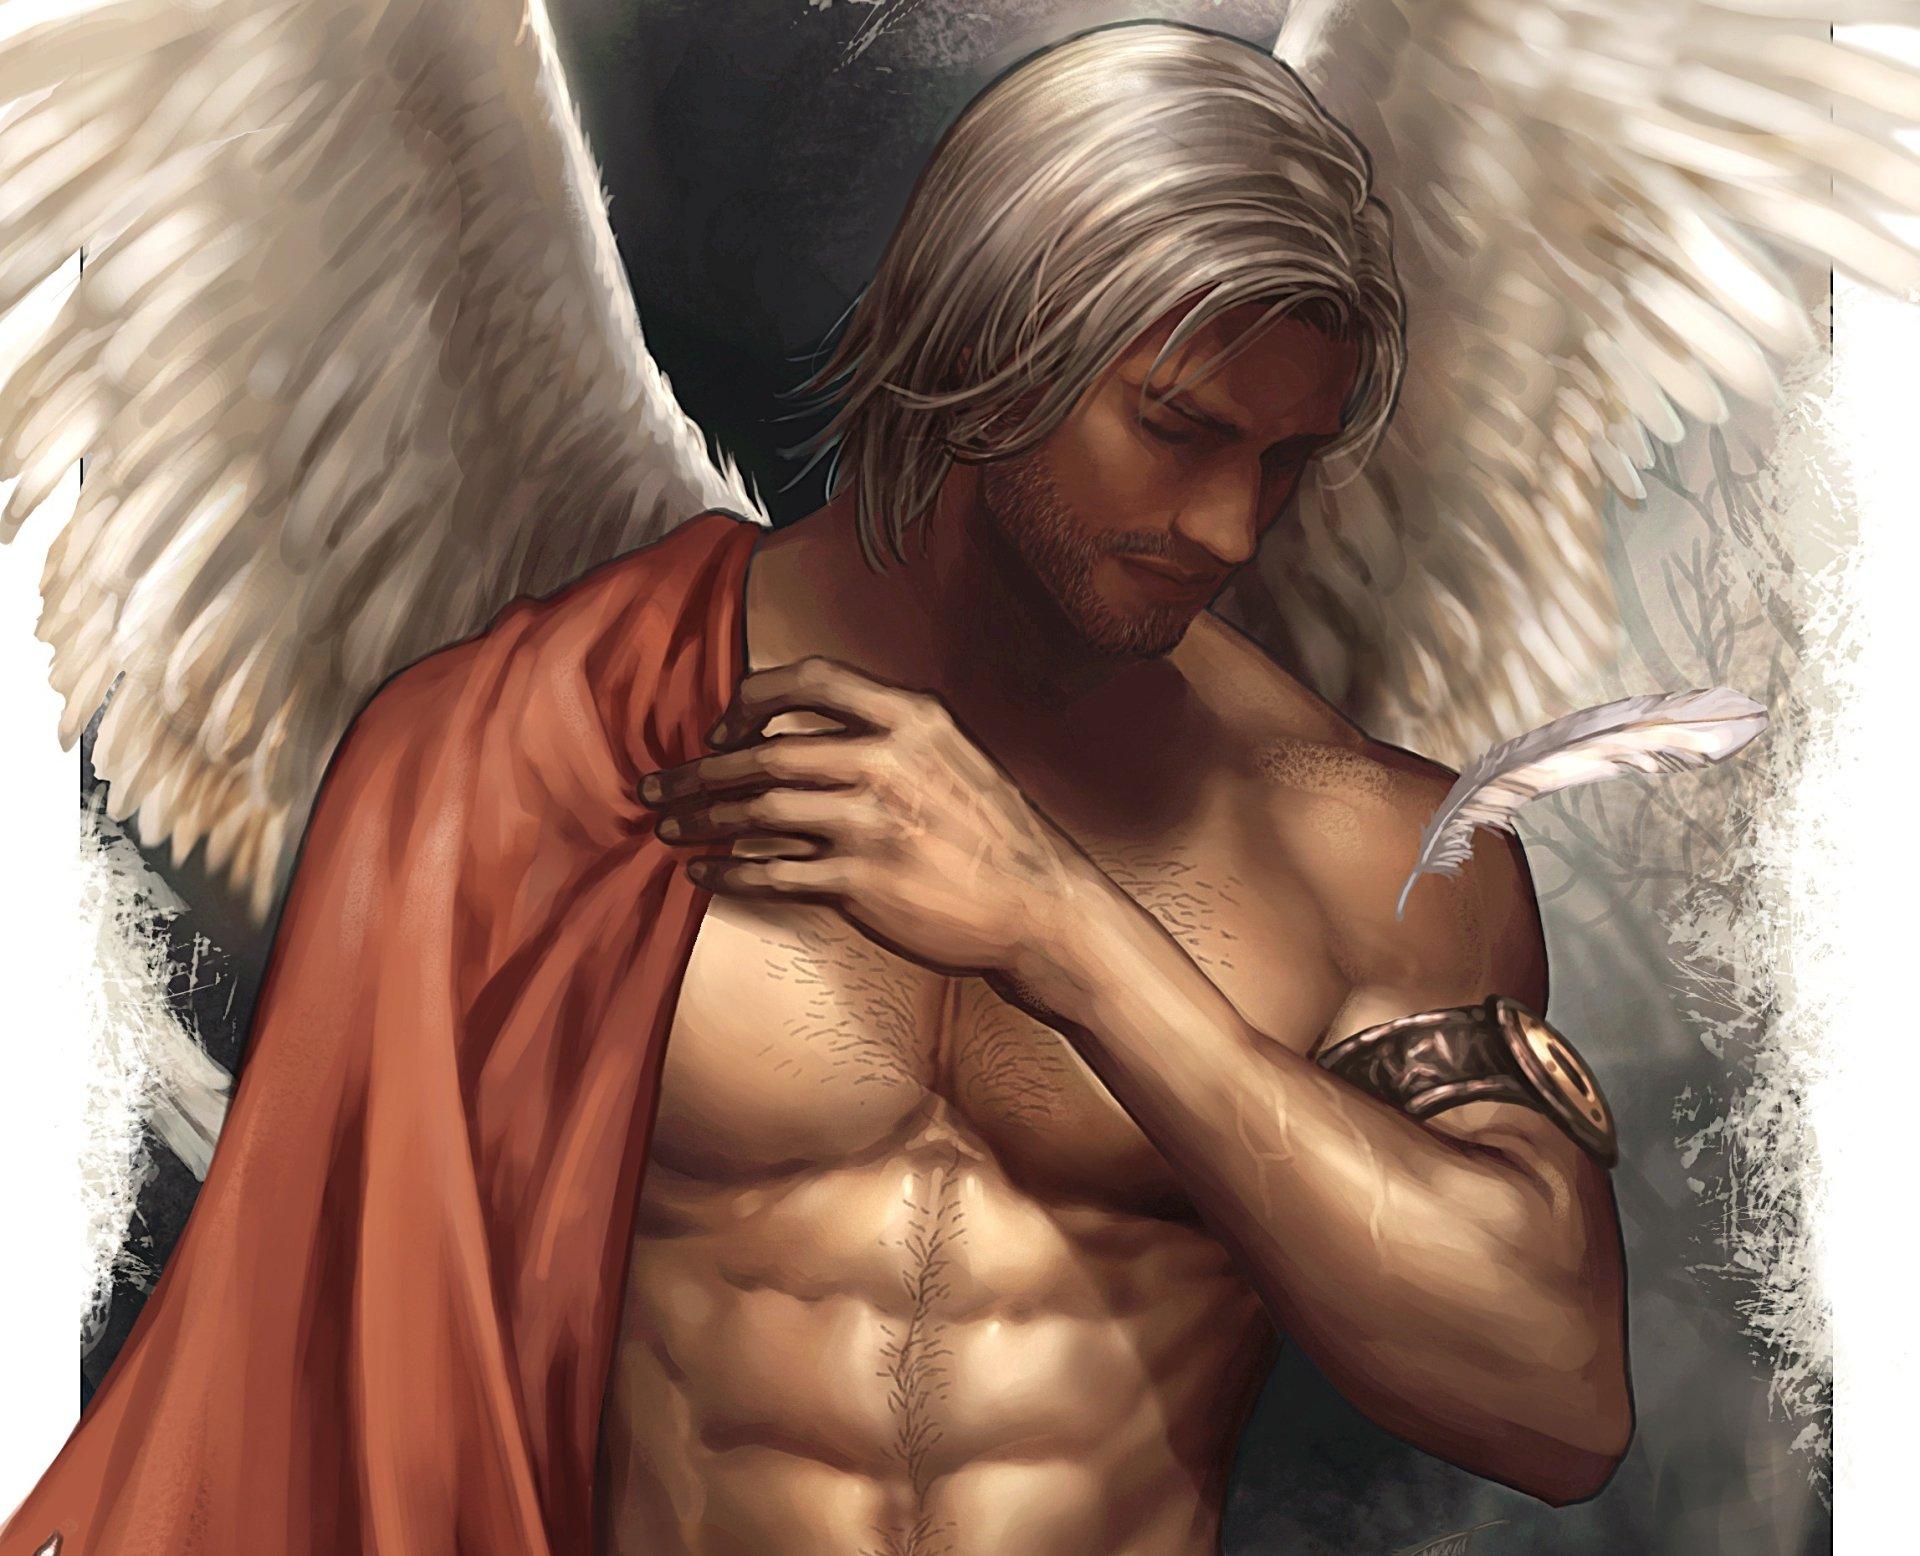 Sad angel hd wallpaper background image 2295x1860 id 684907 wallpaper abyss - Sad angel wallpaper ...